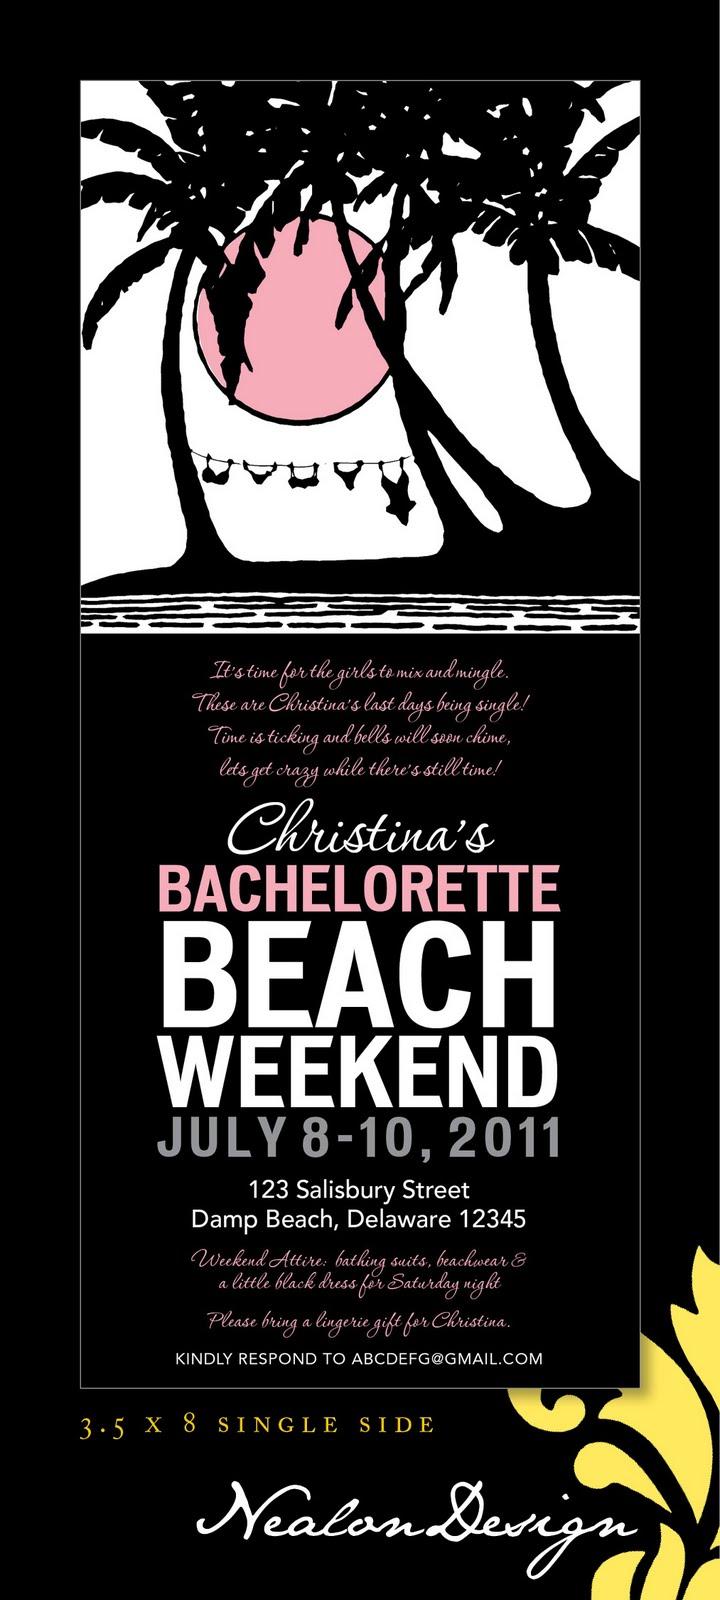 Nealon Design: BACHELORETTE Beach Weekend (Silhouette)